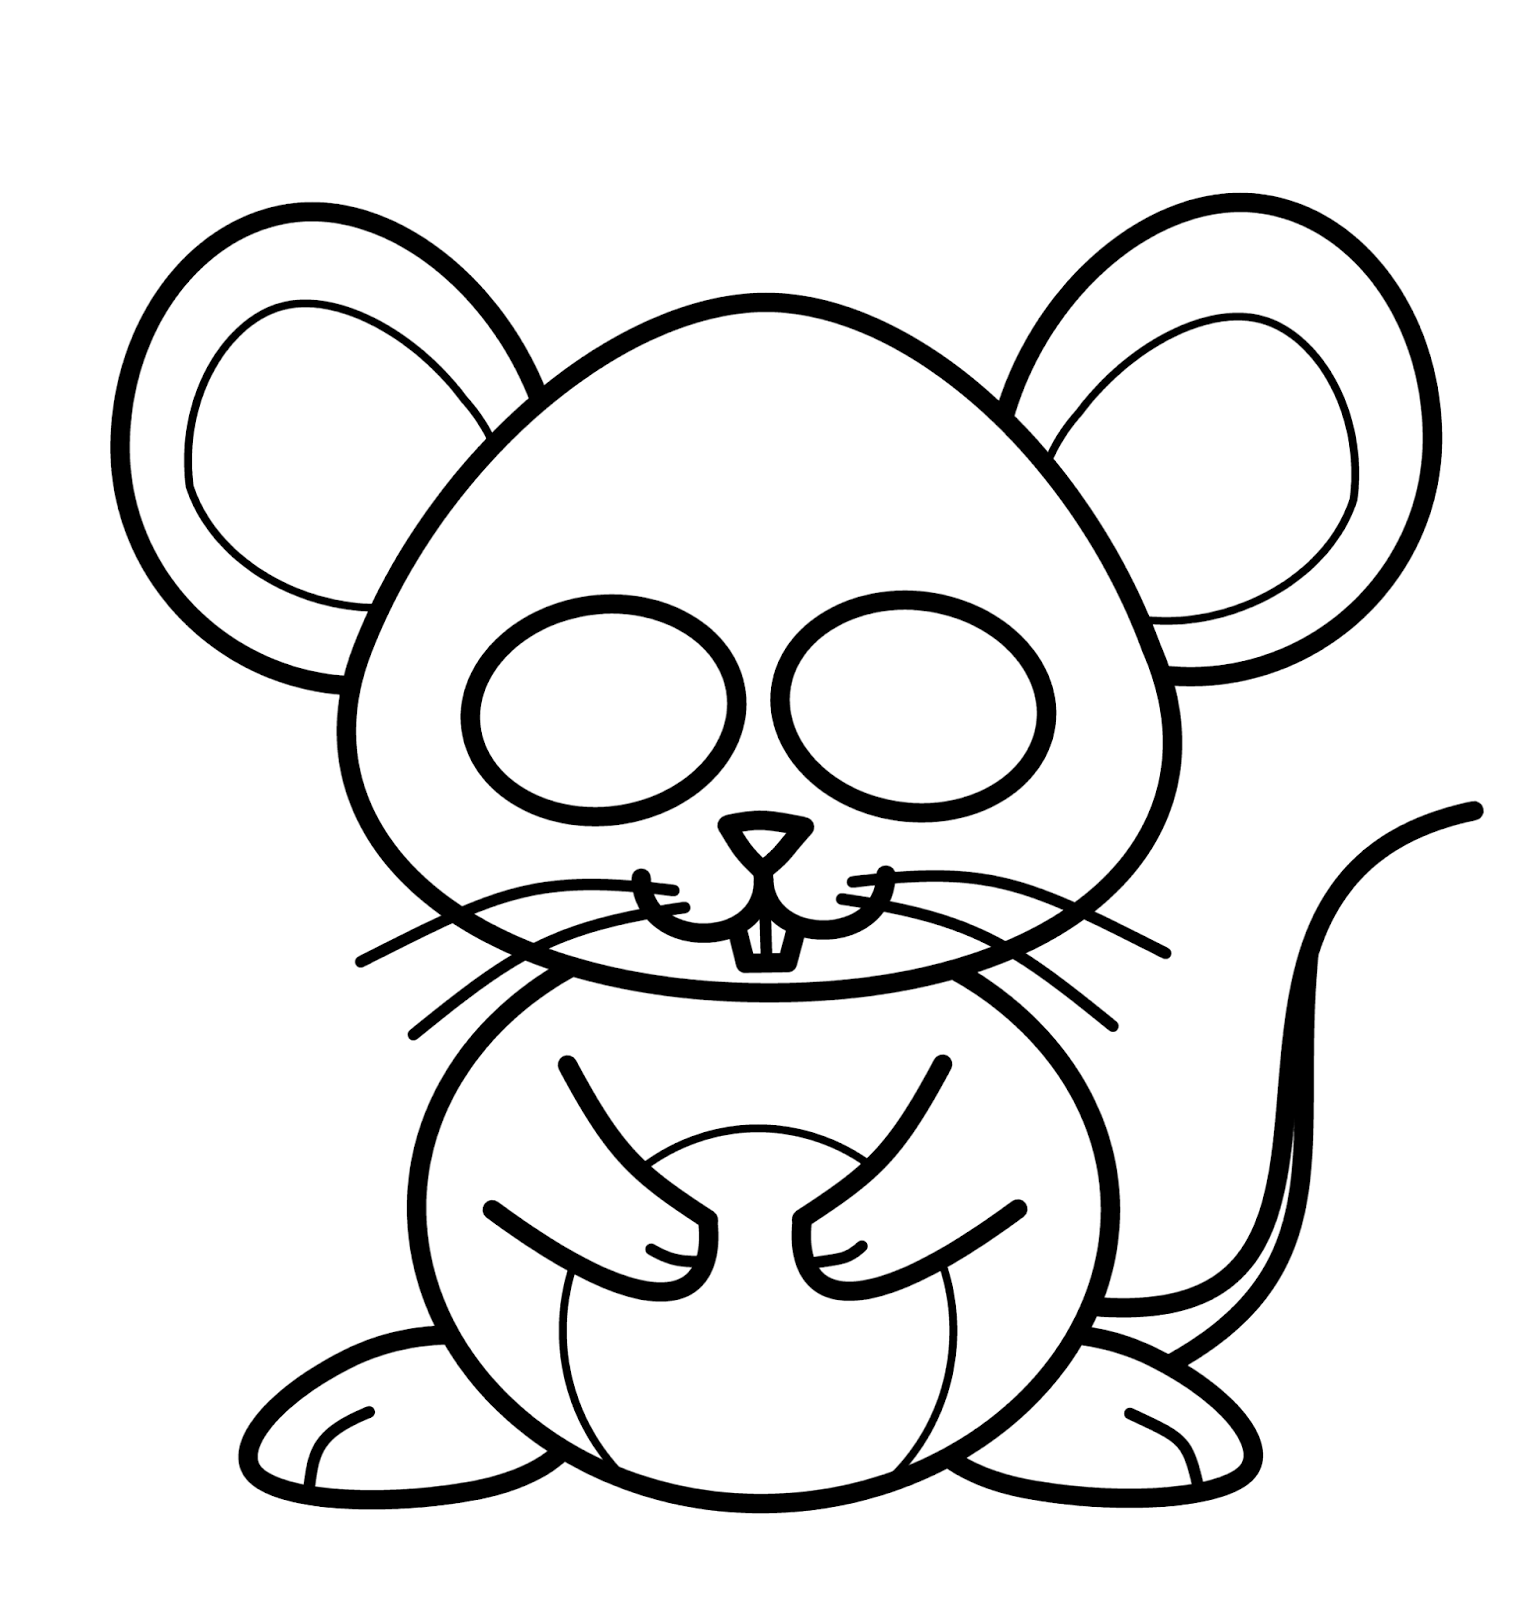 1538x1600 How To Draw Cartoons February 2014